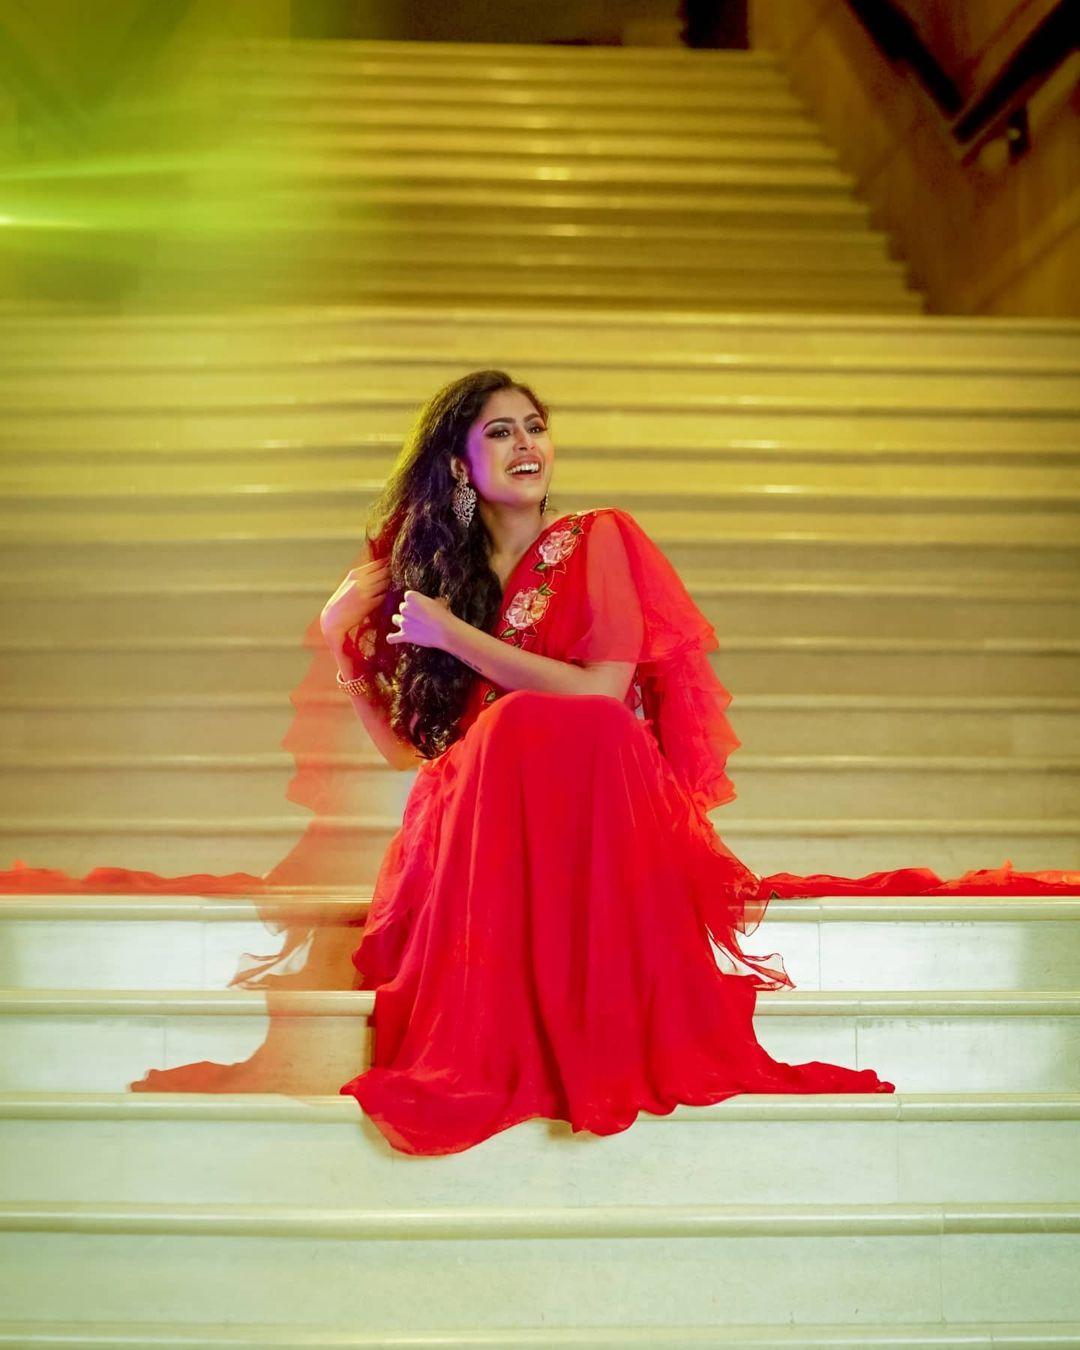 Faria Abdullah hottest photo blouse